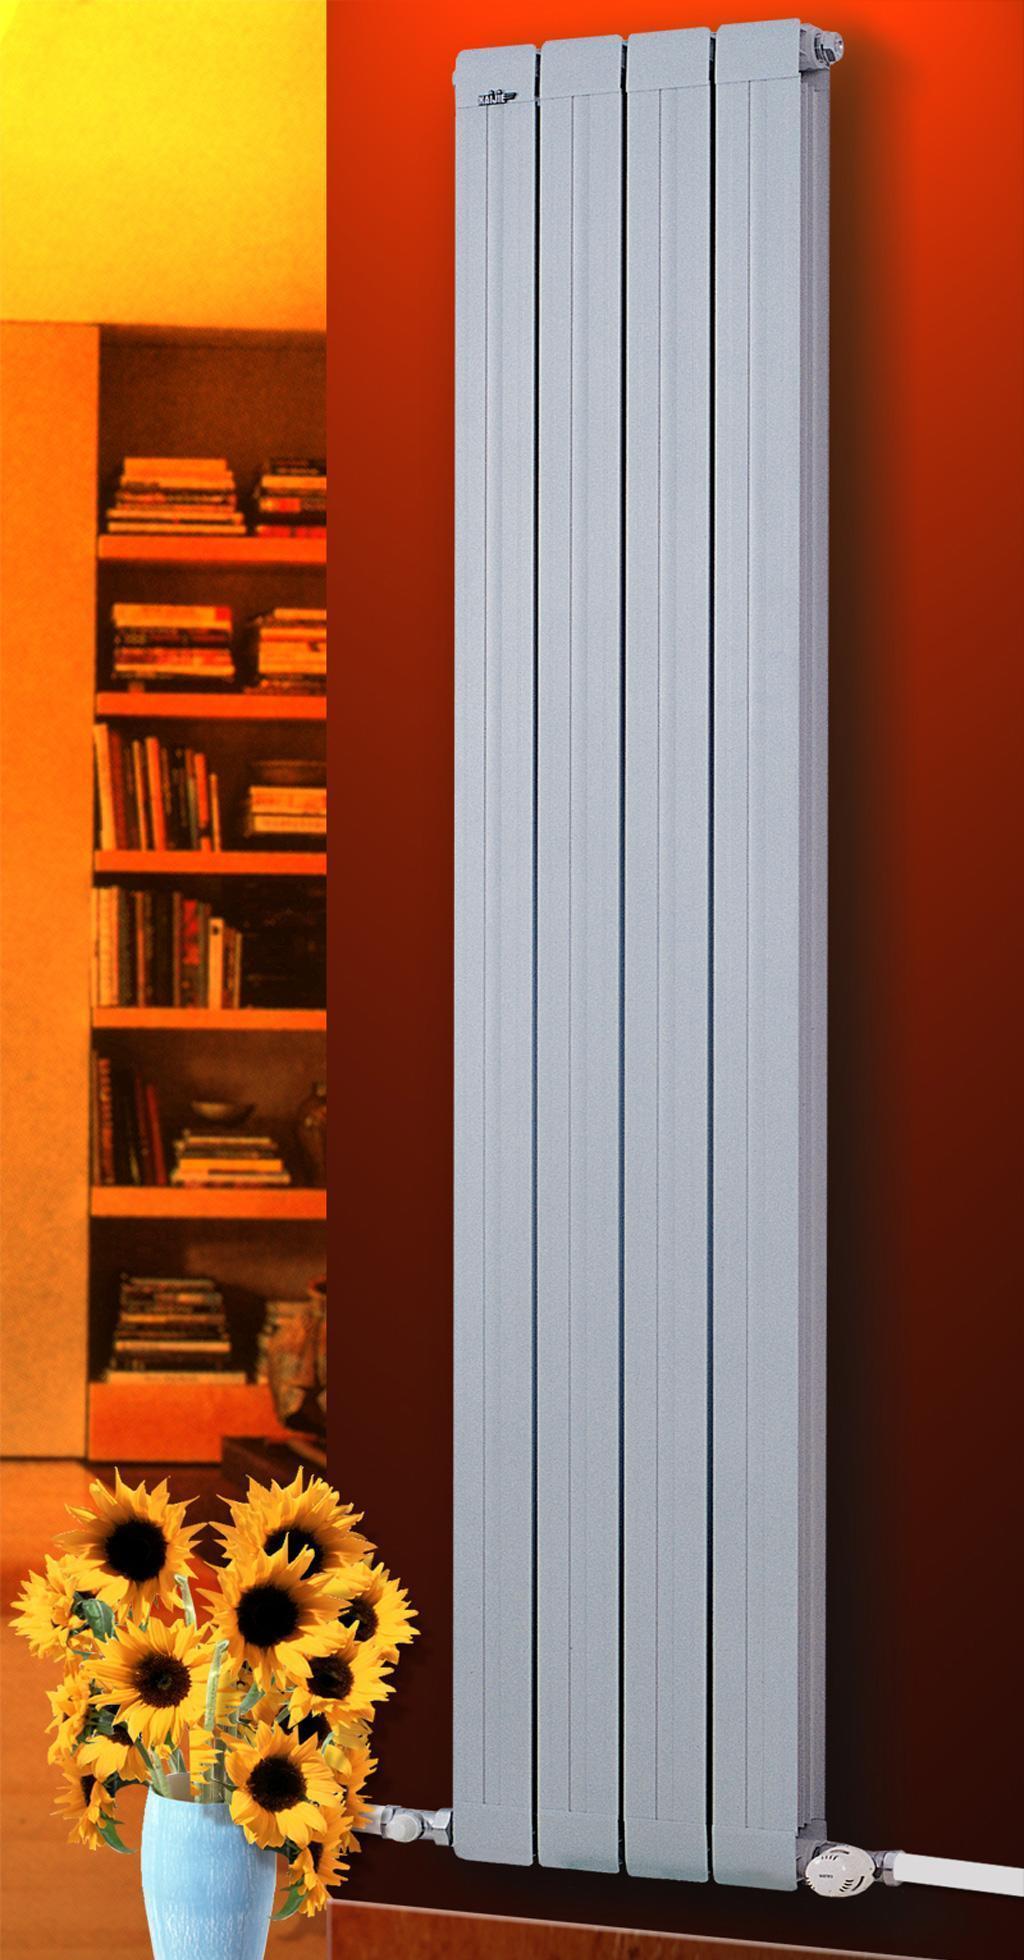 凯捷散热器KTL-4/1800KTL-4/1800